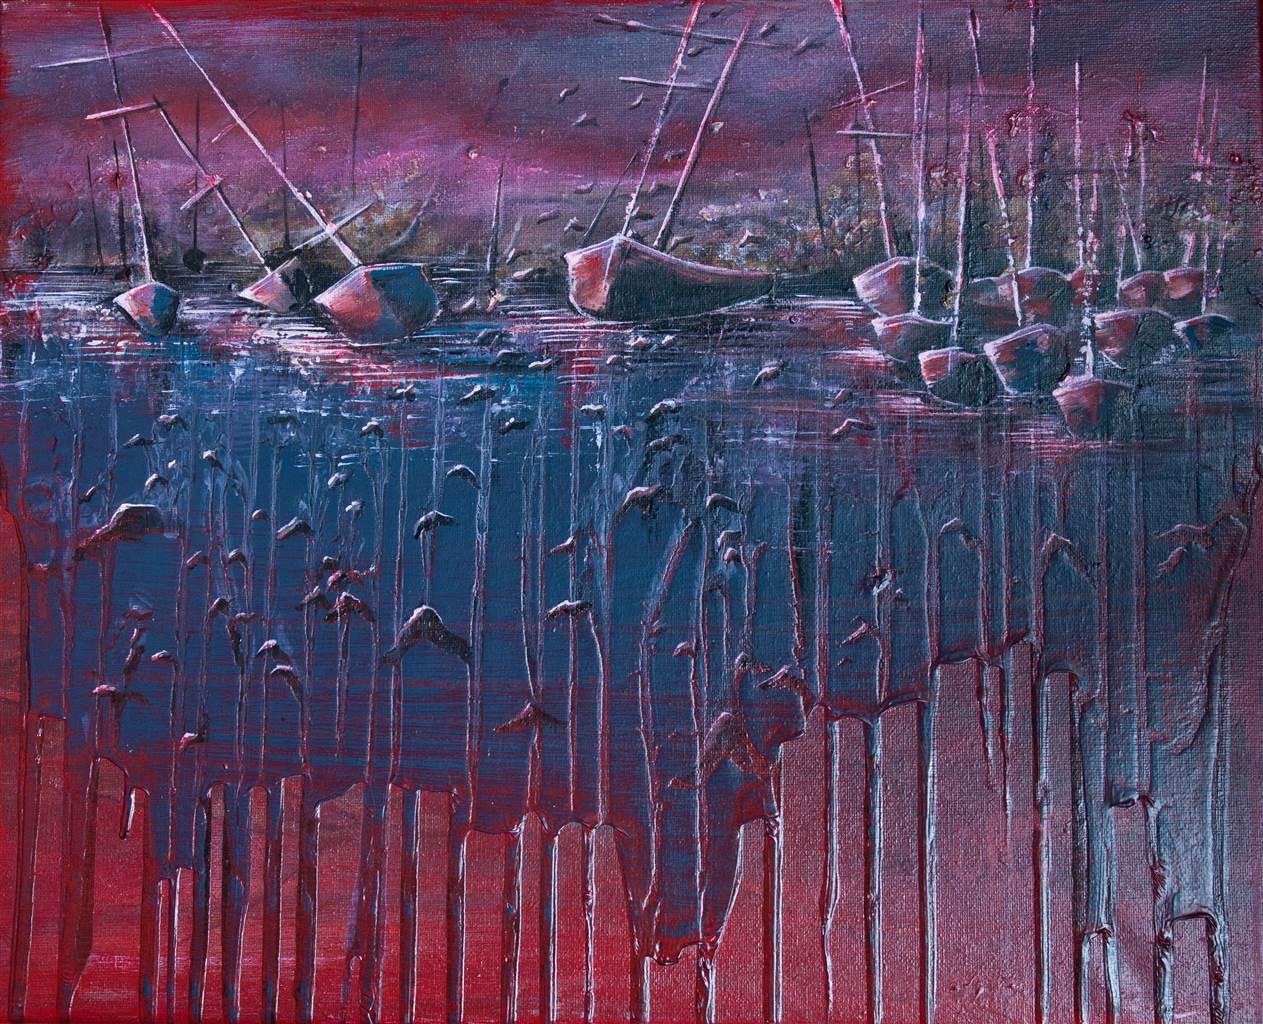 Chantal Roy,Interruption,Acrylic on Canvas,16''x20'' image